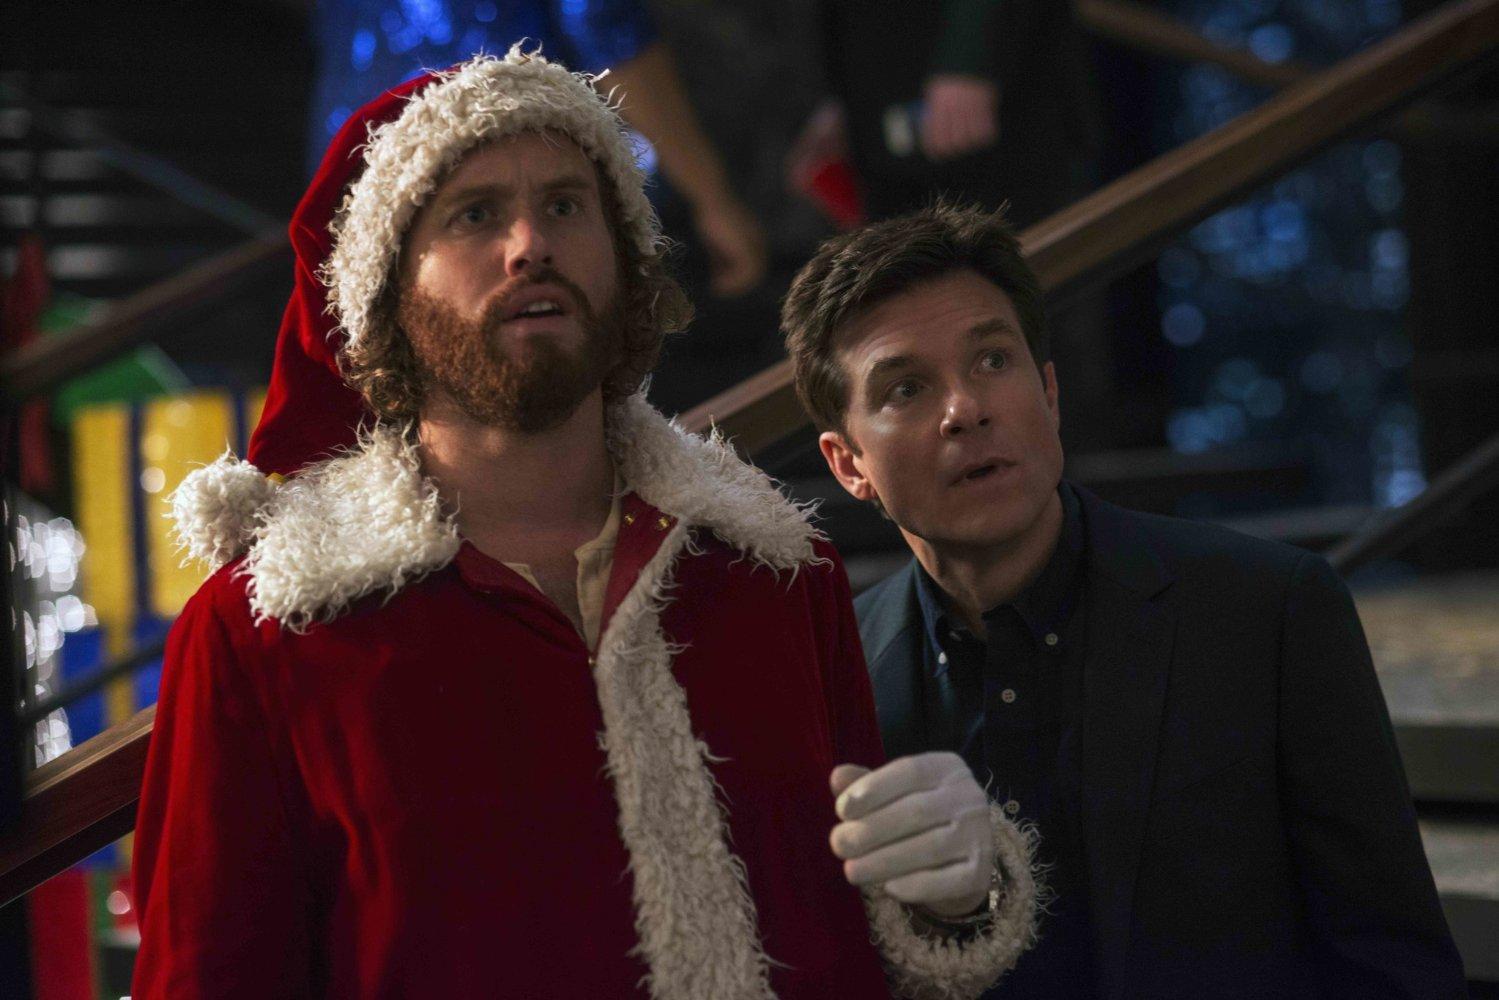 Recenze: Pařba o Vánocích | Fandíme filmu